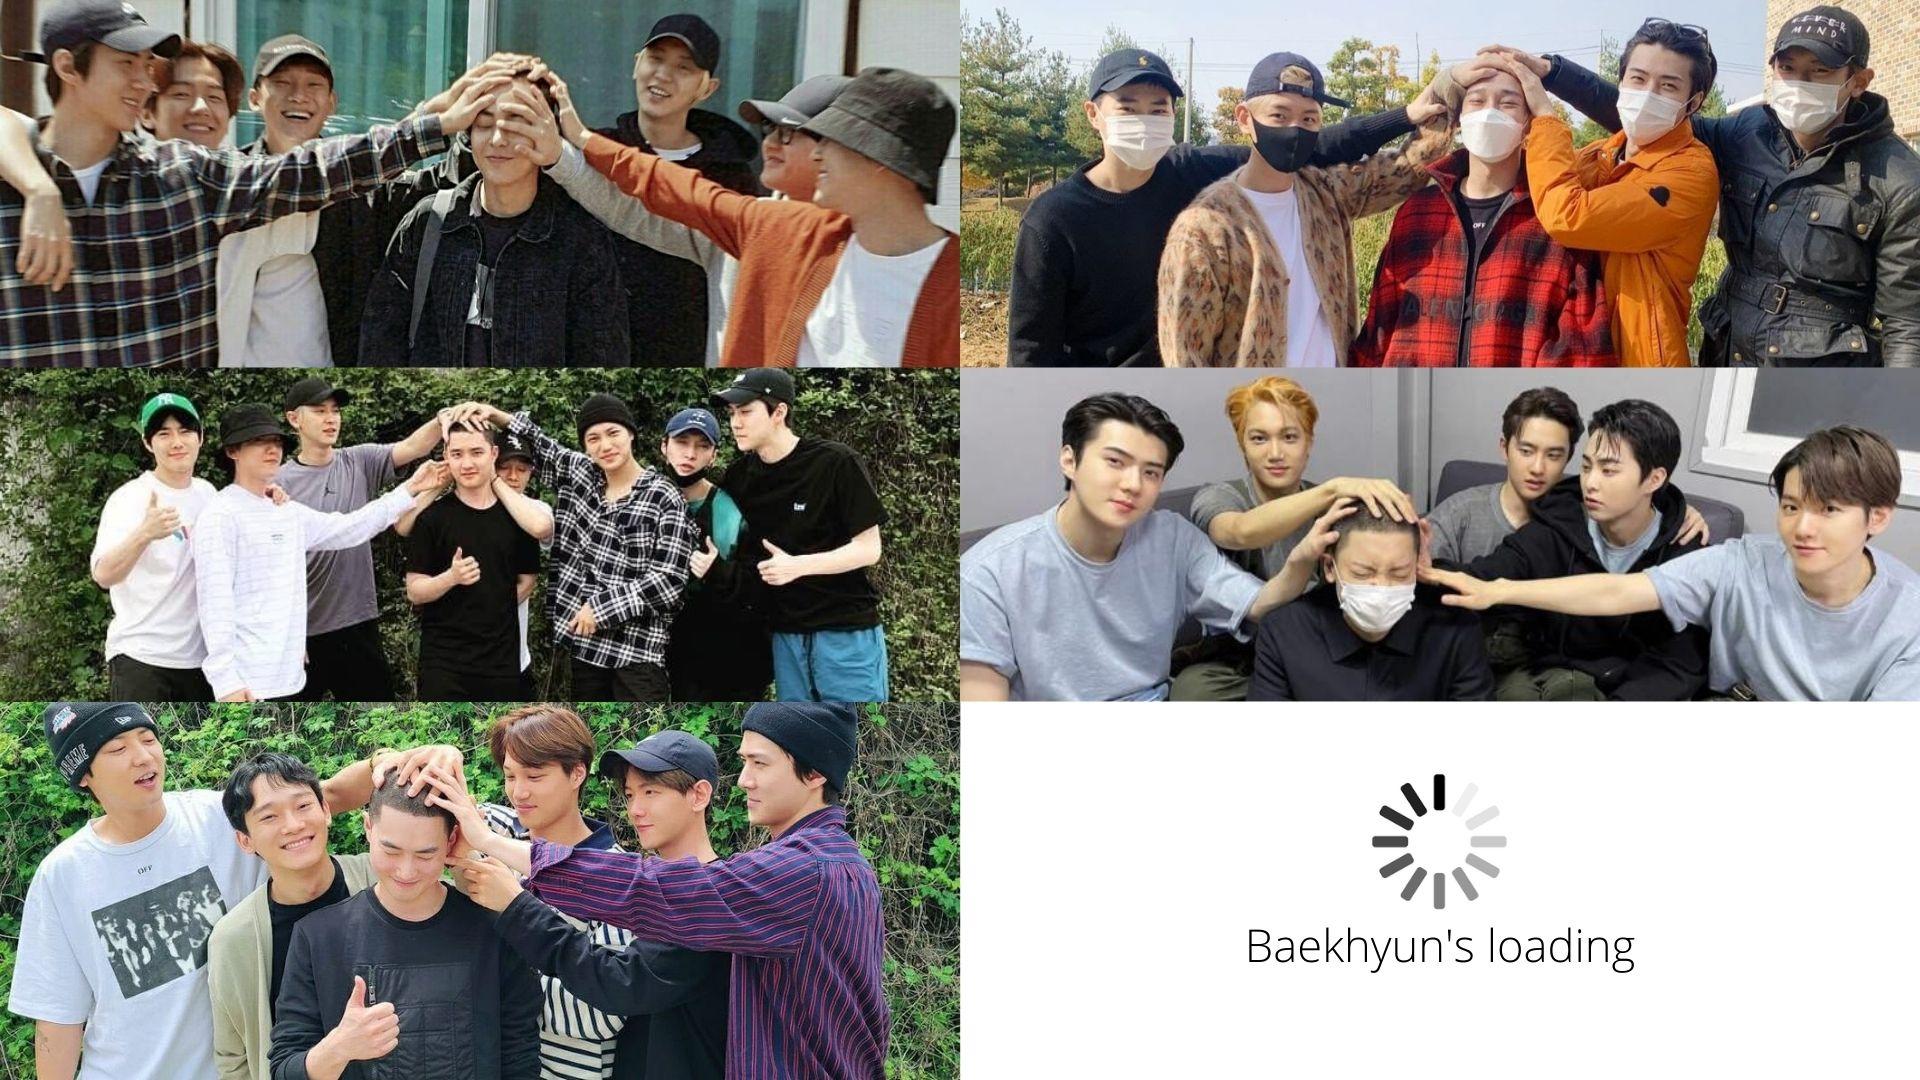 EXO's Baekhyun Enlists on His Birthday